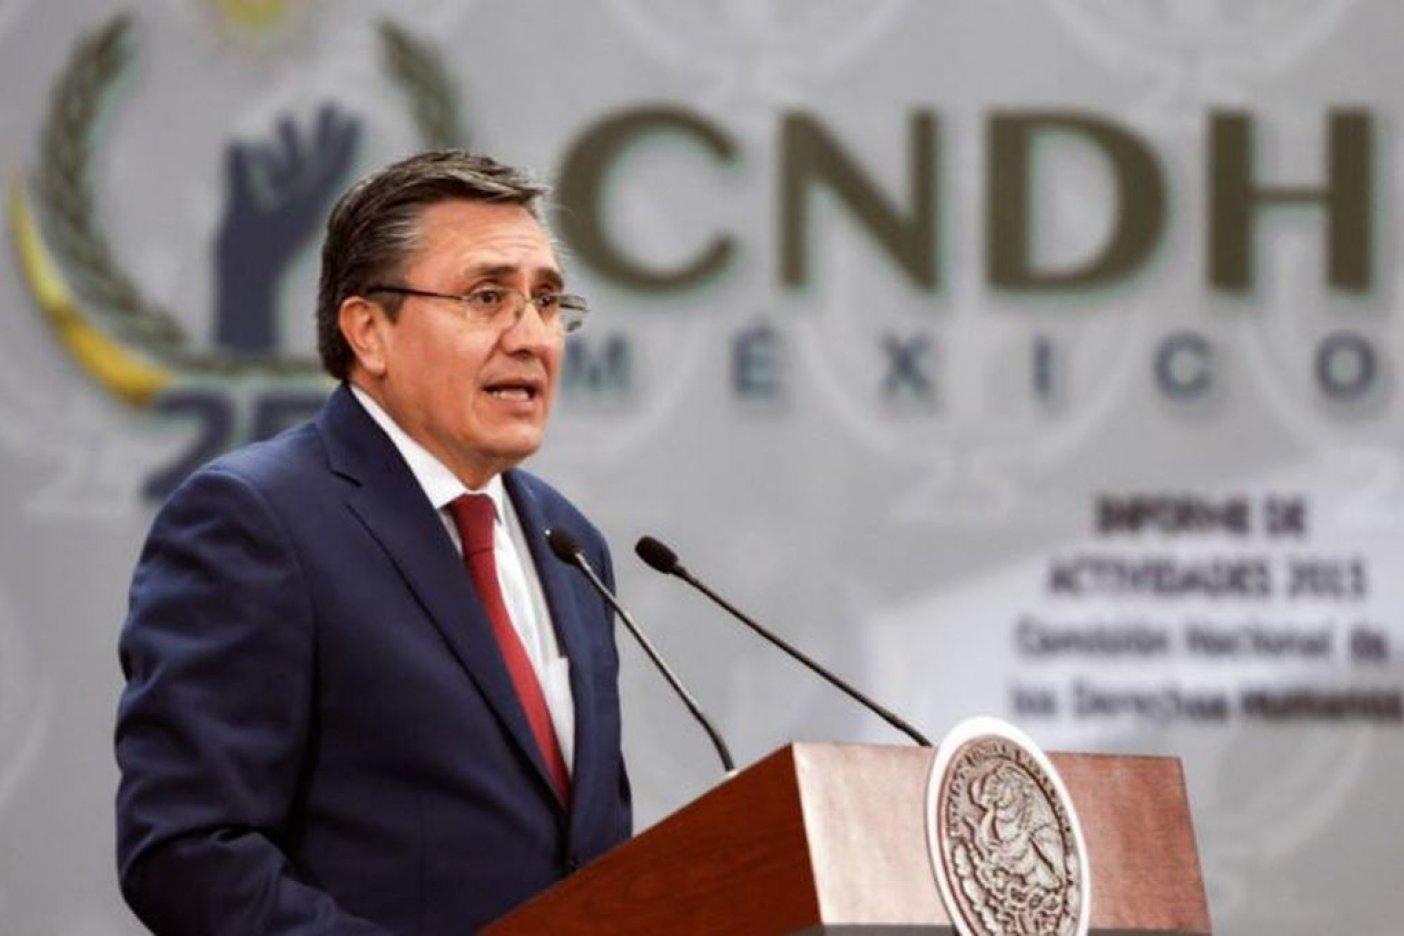 Trasladan a penal de Tepexi de Rodríguez a exchofer de Cabify